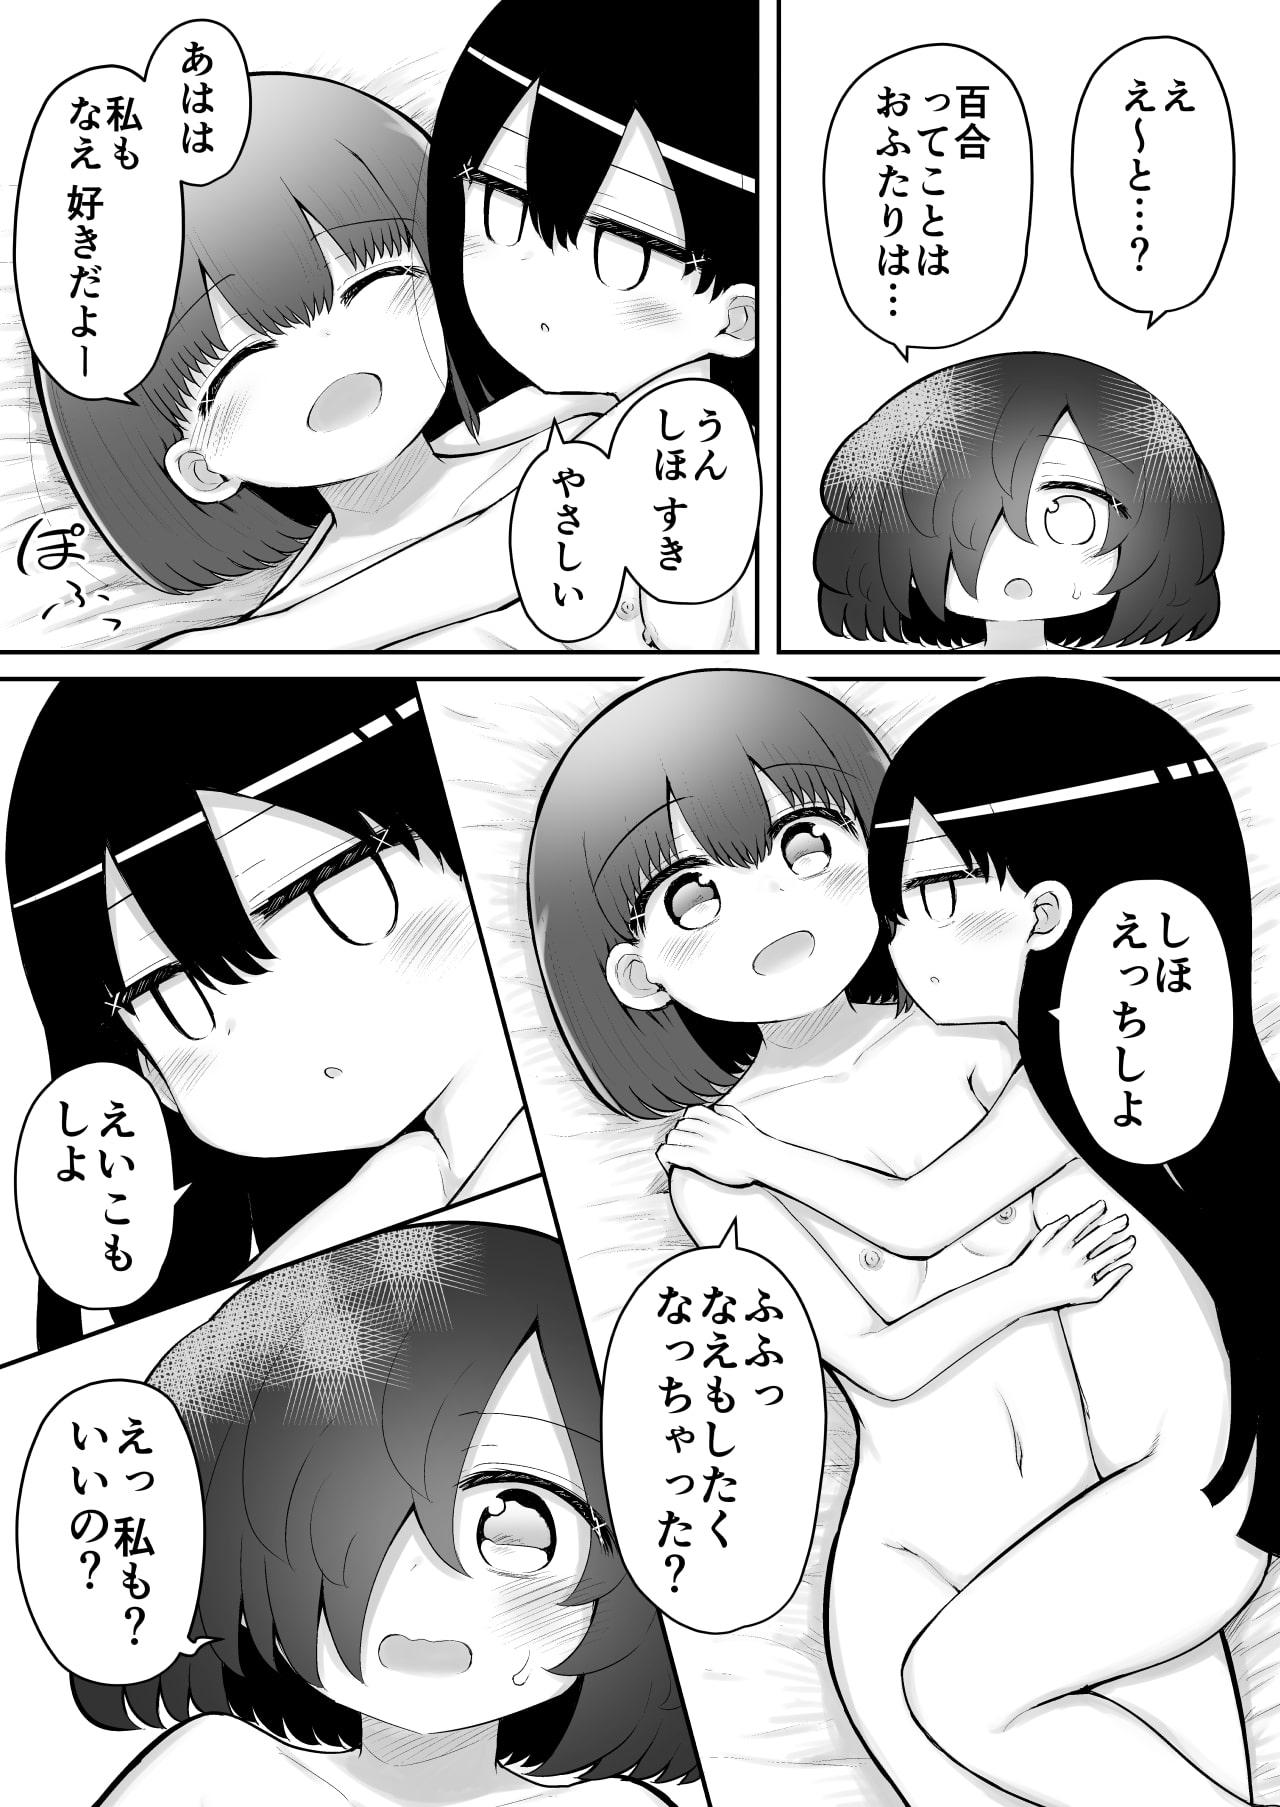 RJ326187 絶頂探偵アクメトラーEIKO後編 [20210502]